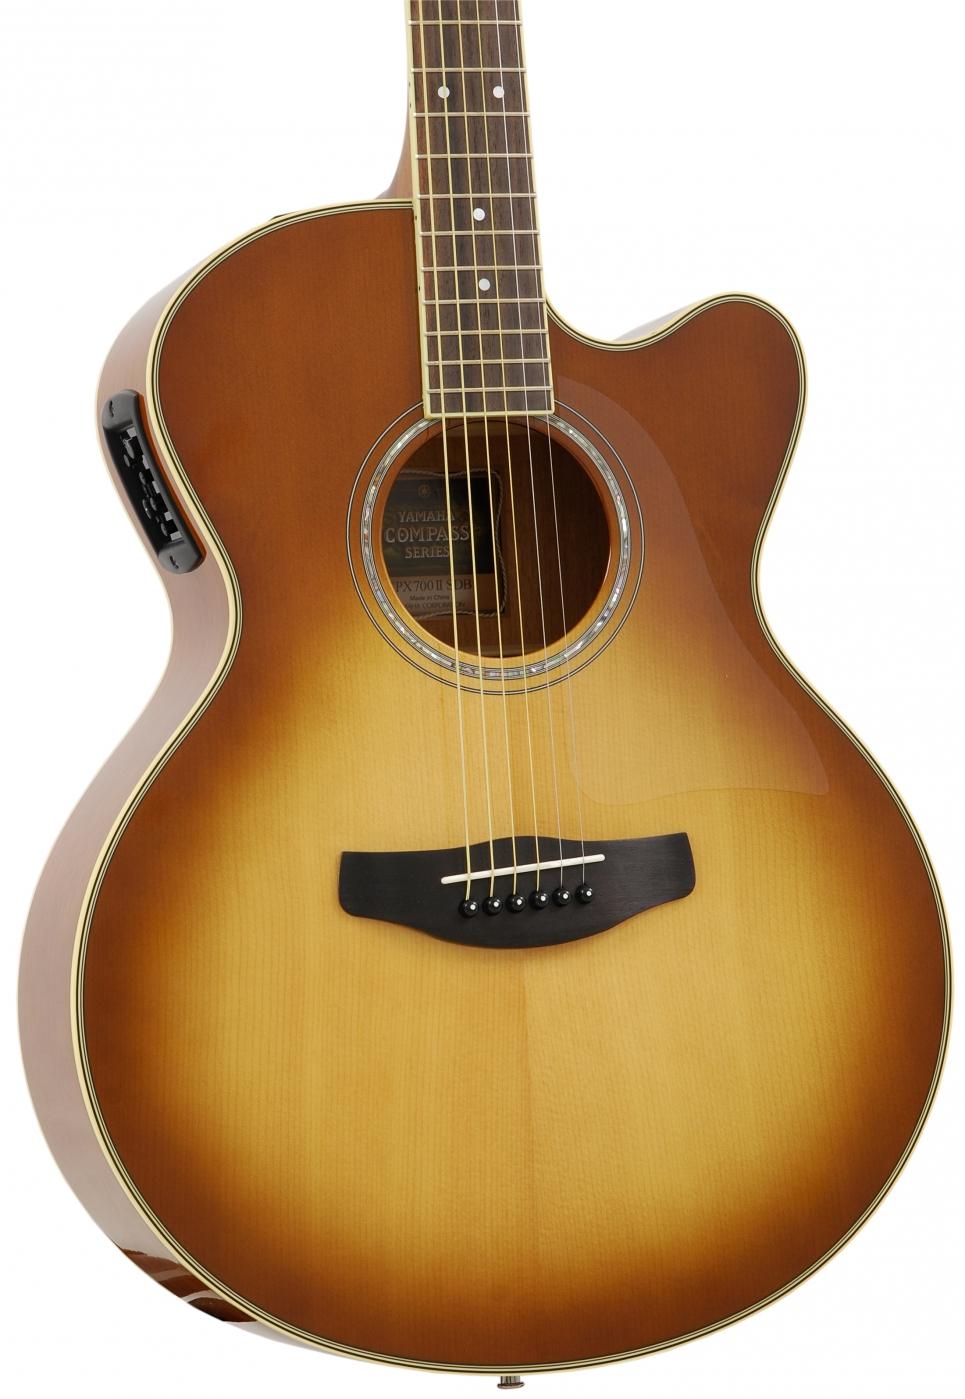 yamaha cpx 700 ii sb elektro akustik gitarre. Black Bedroom Furniture Sets. Home Design Ideas